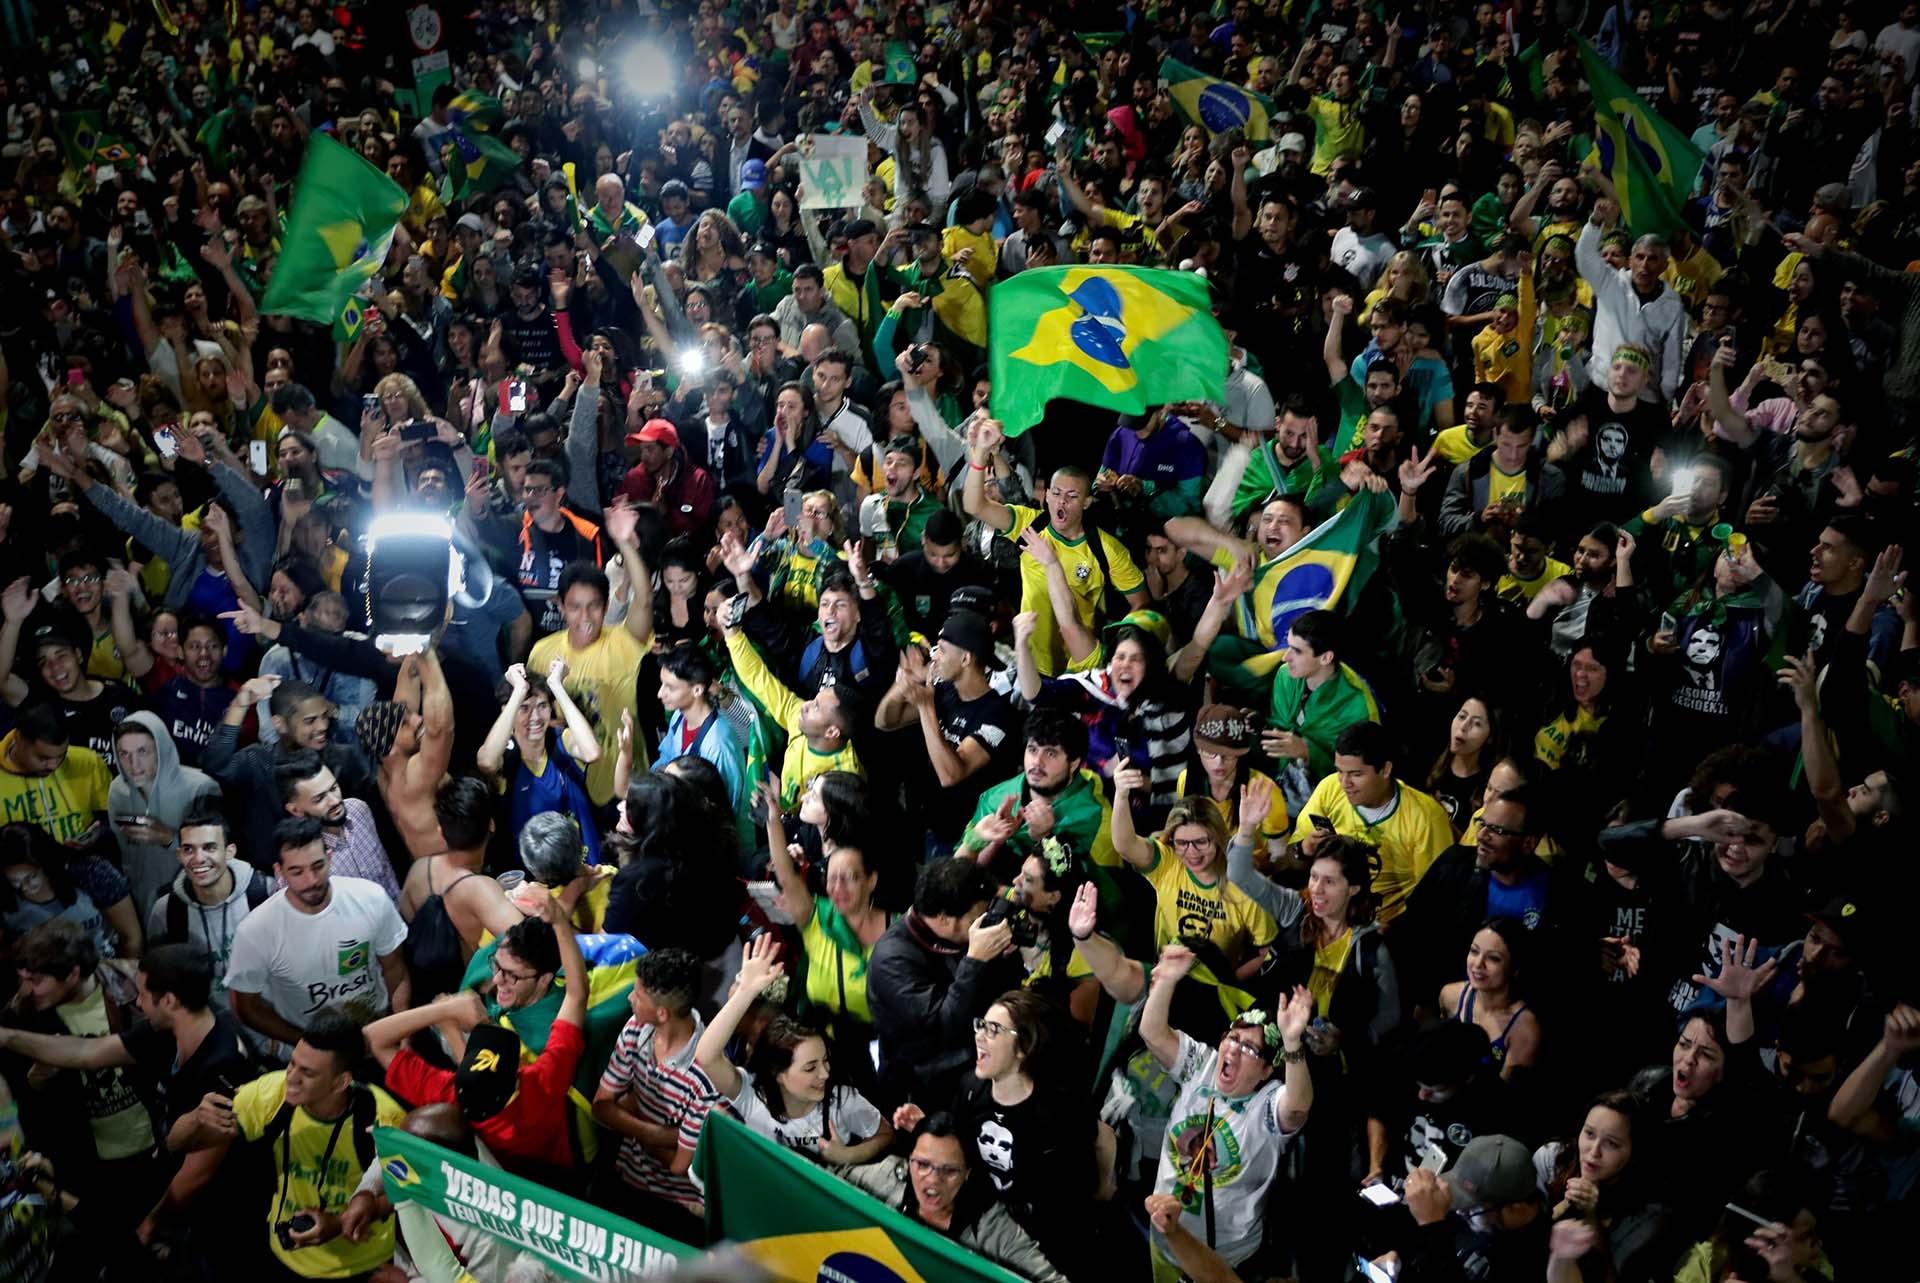 Miles de manifestantes se movilizaron en San Pablo tras la victoria de Jair Bolsonaro(EFE/Fernando Bizerra)